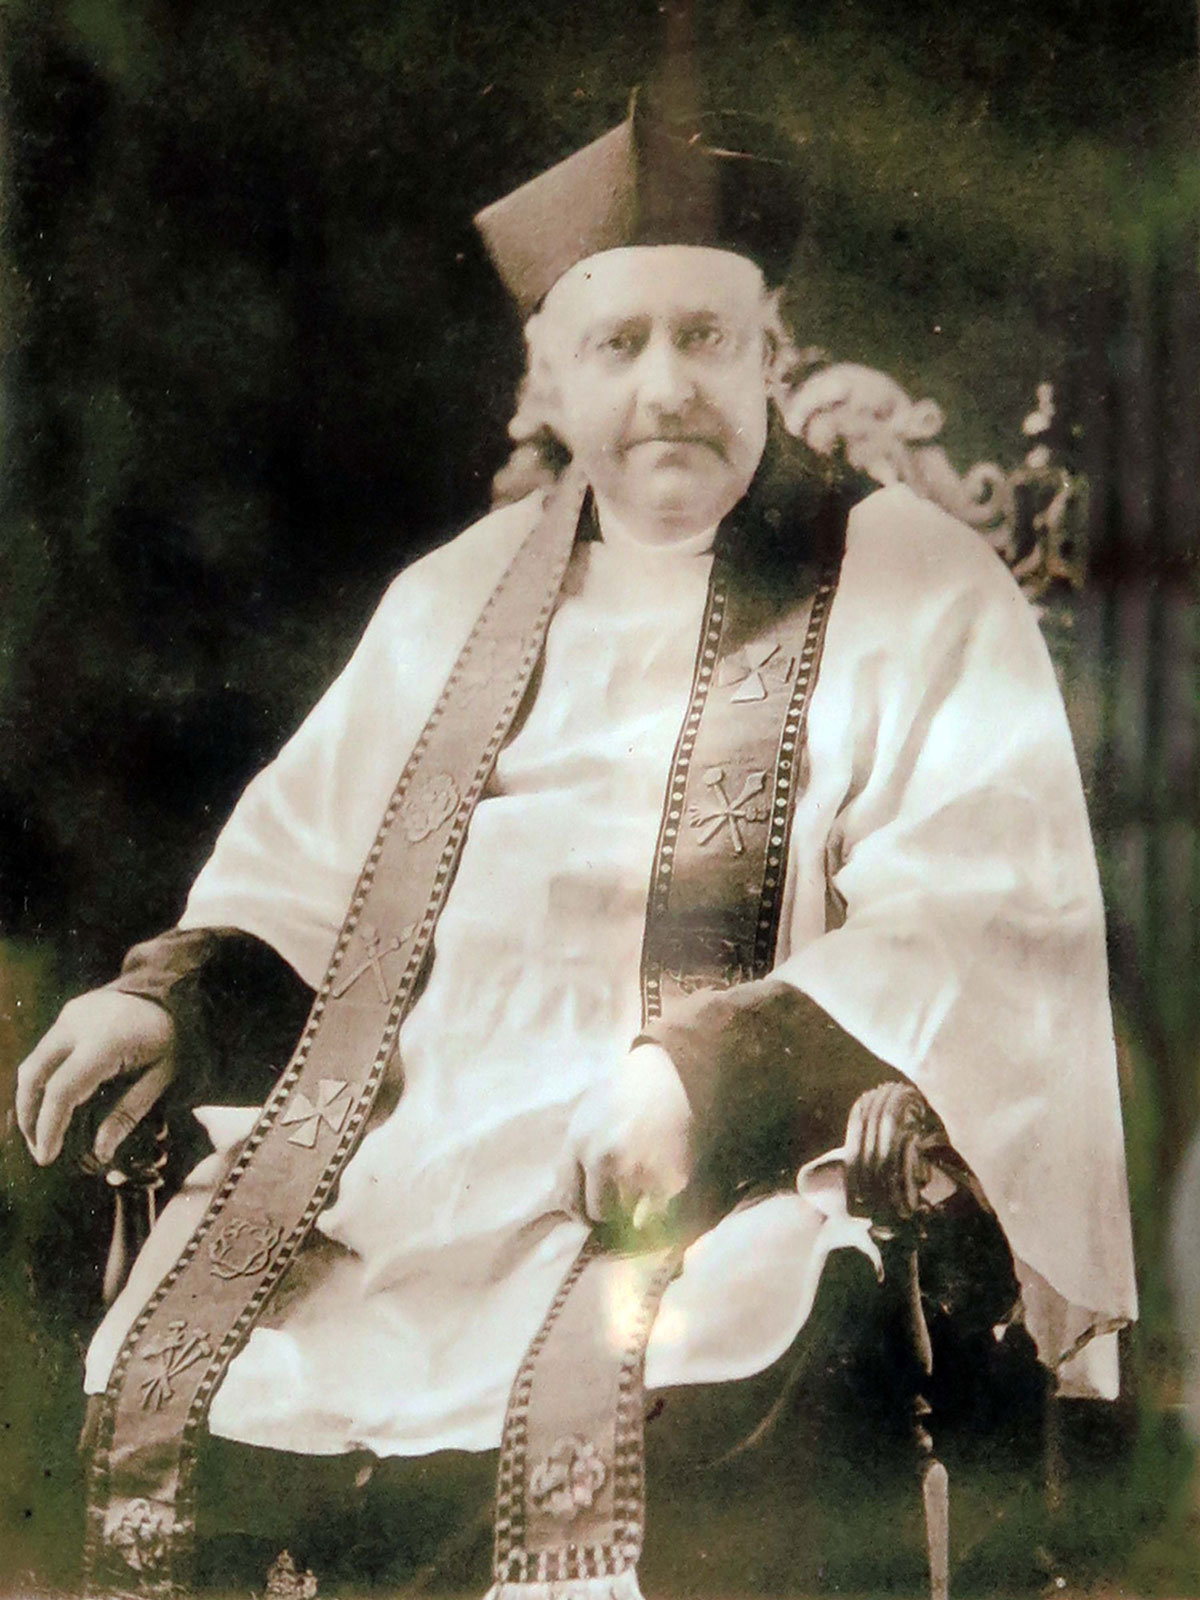 The Reverend Robert Stephen Hawker